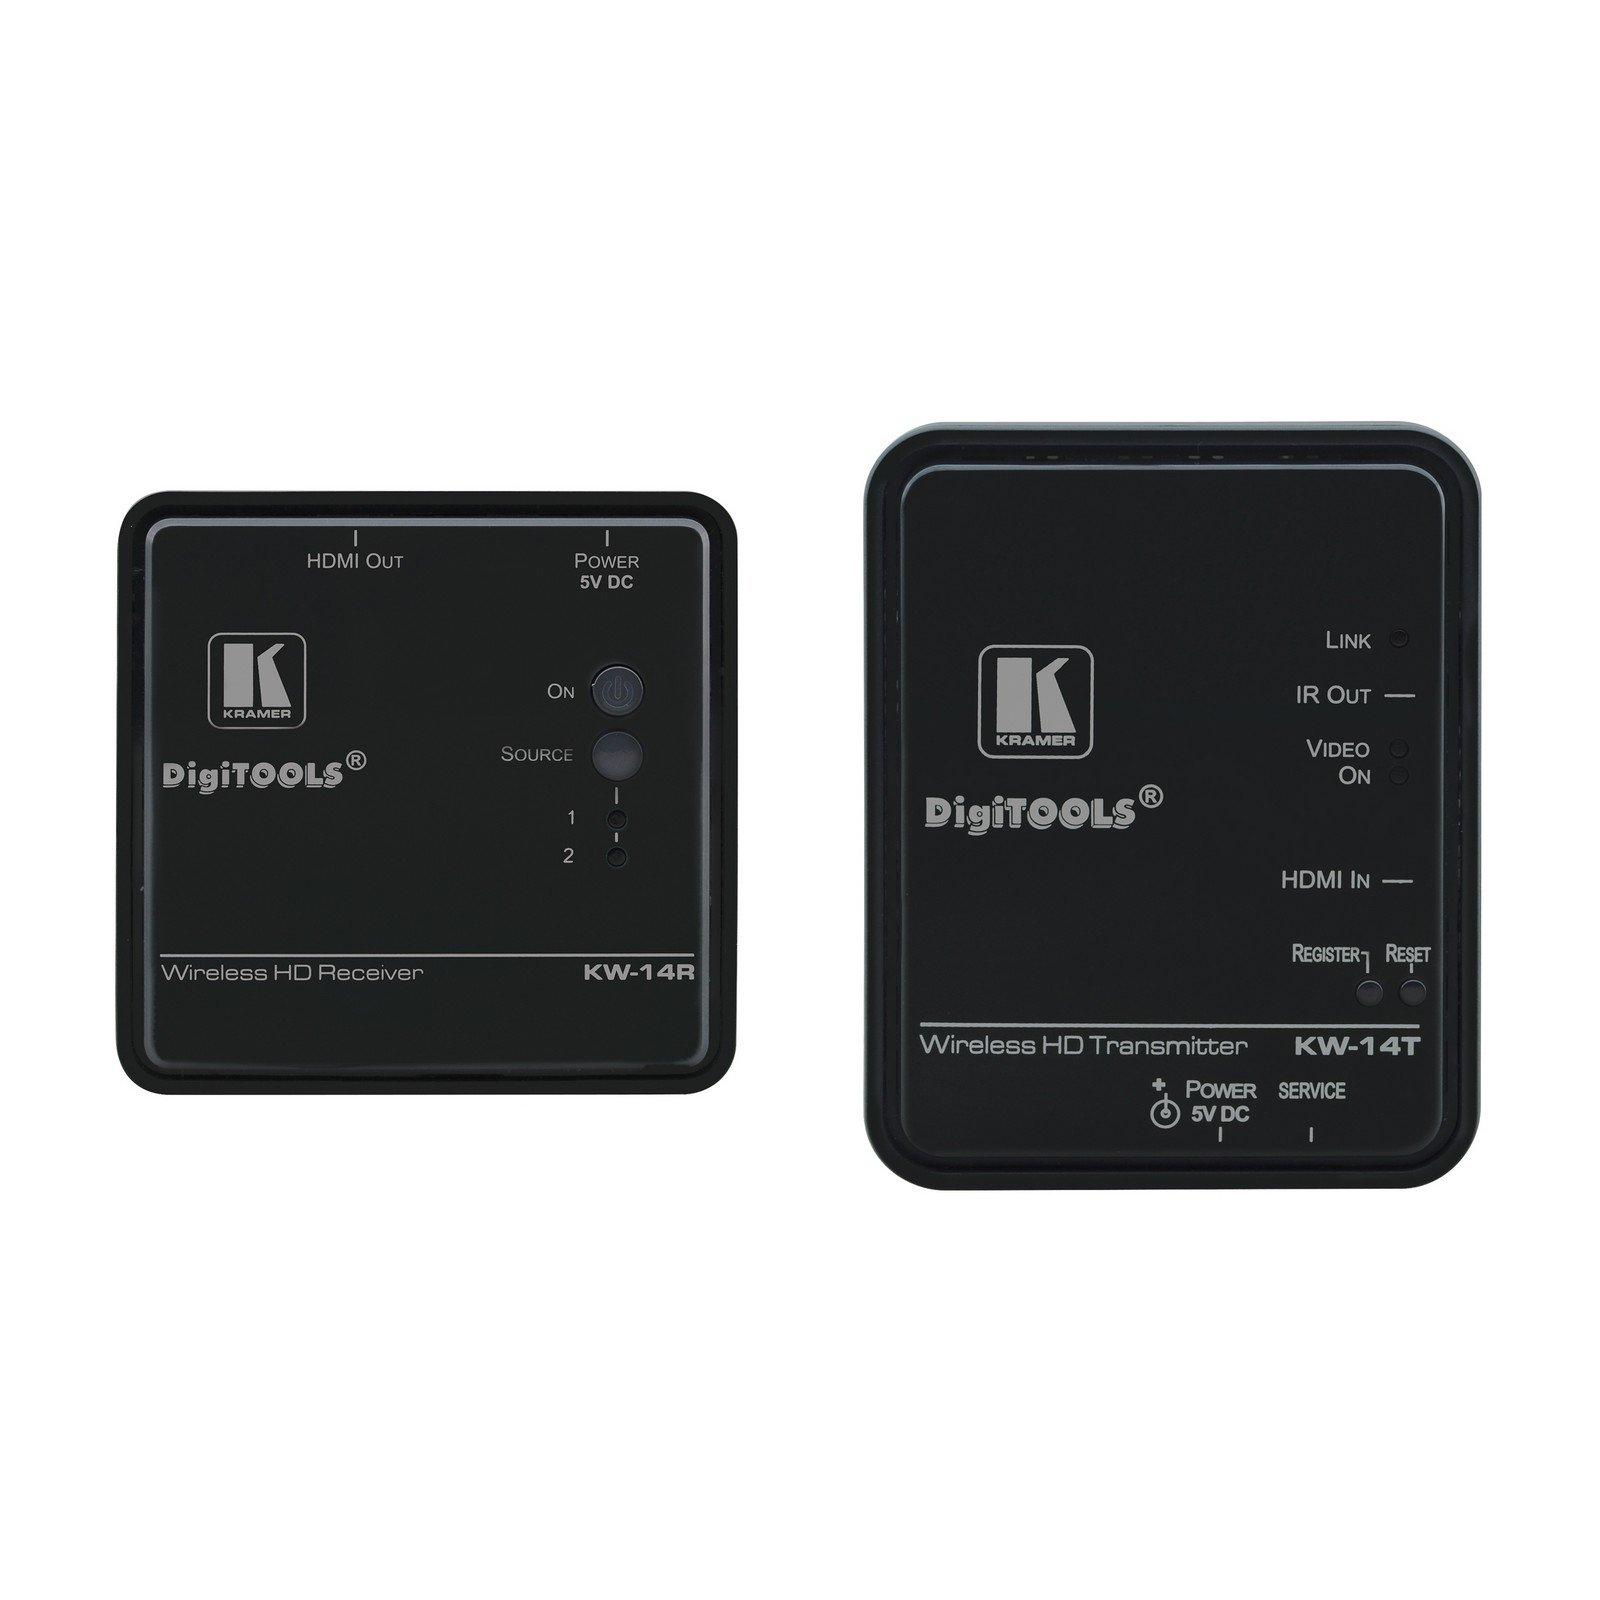 Kramer KW-14 | Expandable Wireless HDMI Video Transmitter Receiver by Kramer